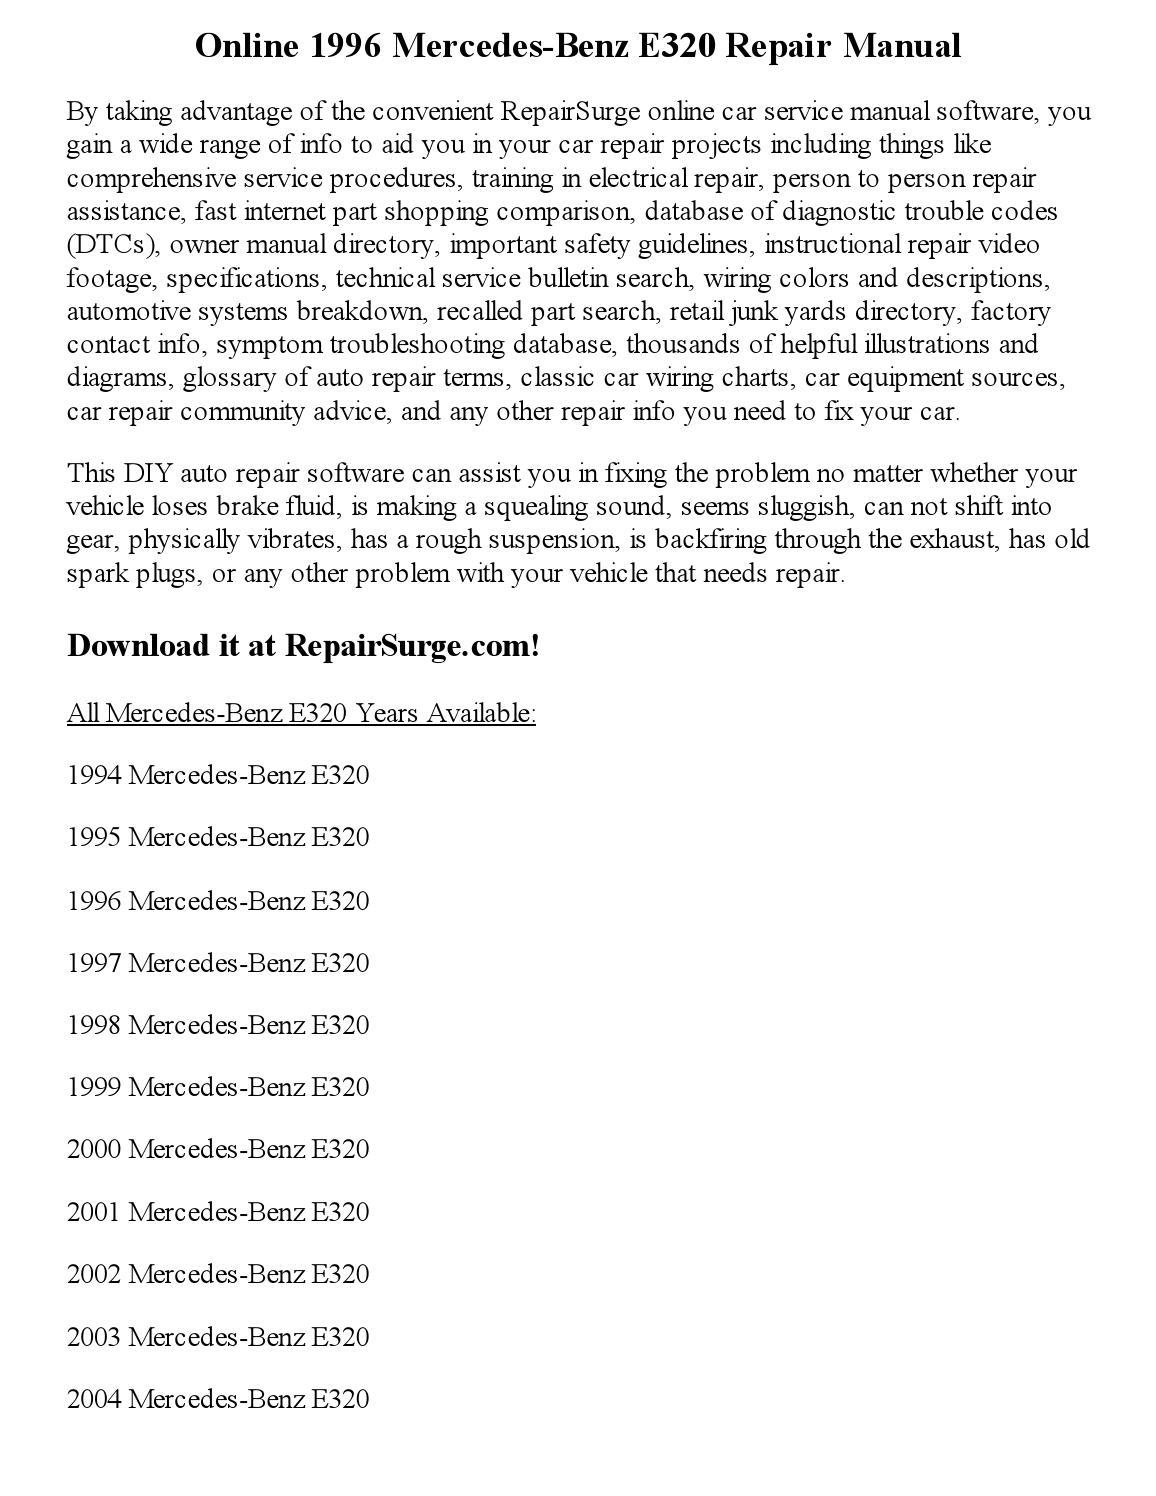 1996 Mercedes Benz E320 Repair Manual Online By Joseph